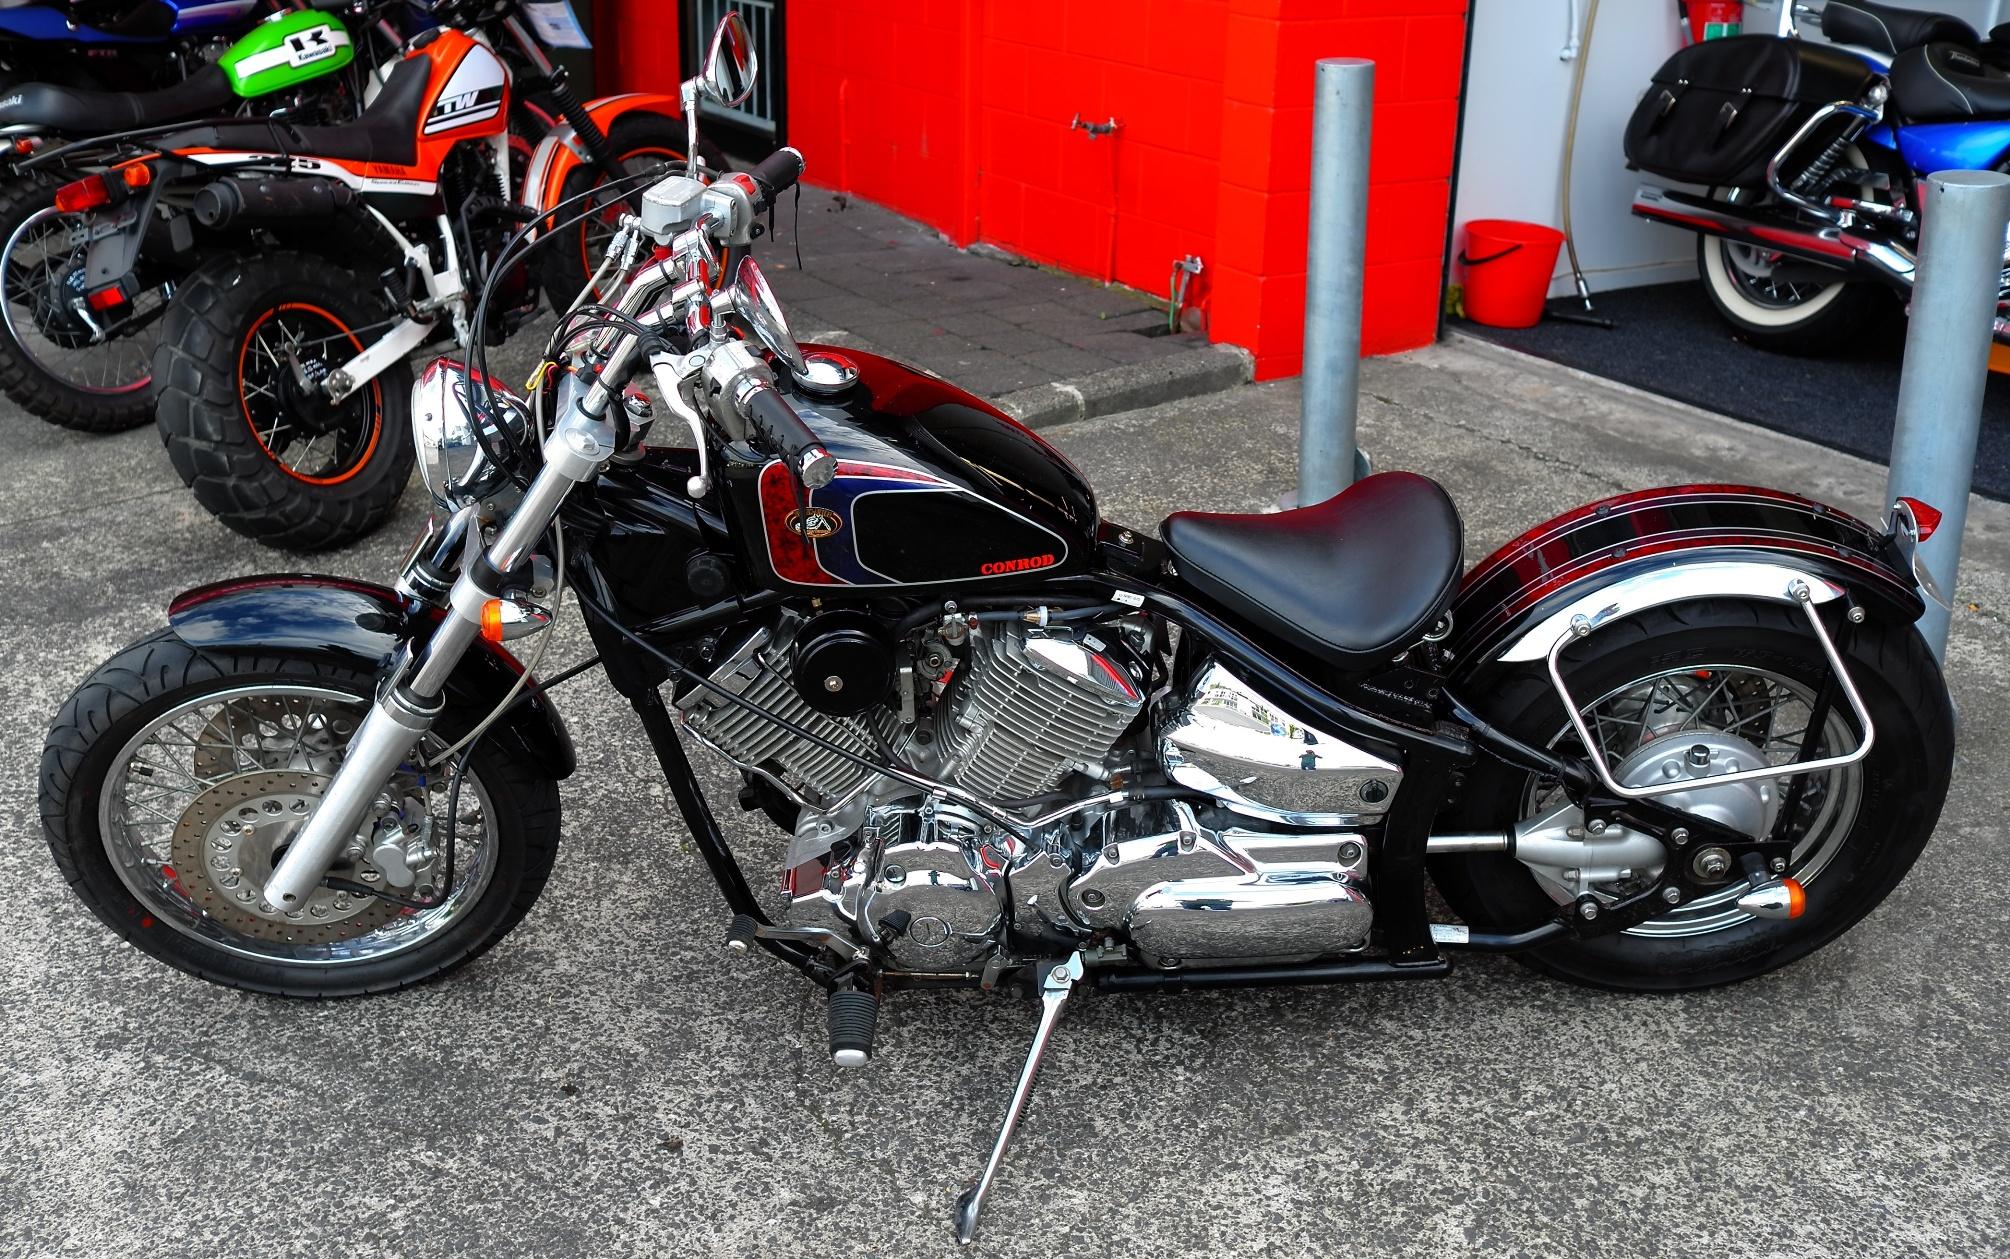 2002 yamaha dragstar 1100 bobber shore motor cycles. Black Bedroom Furniture Sets. Home Design Ideas